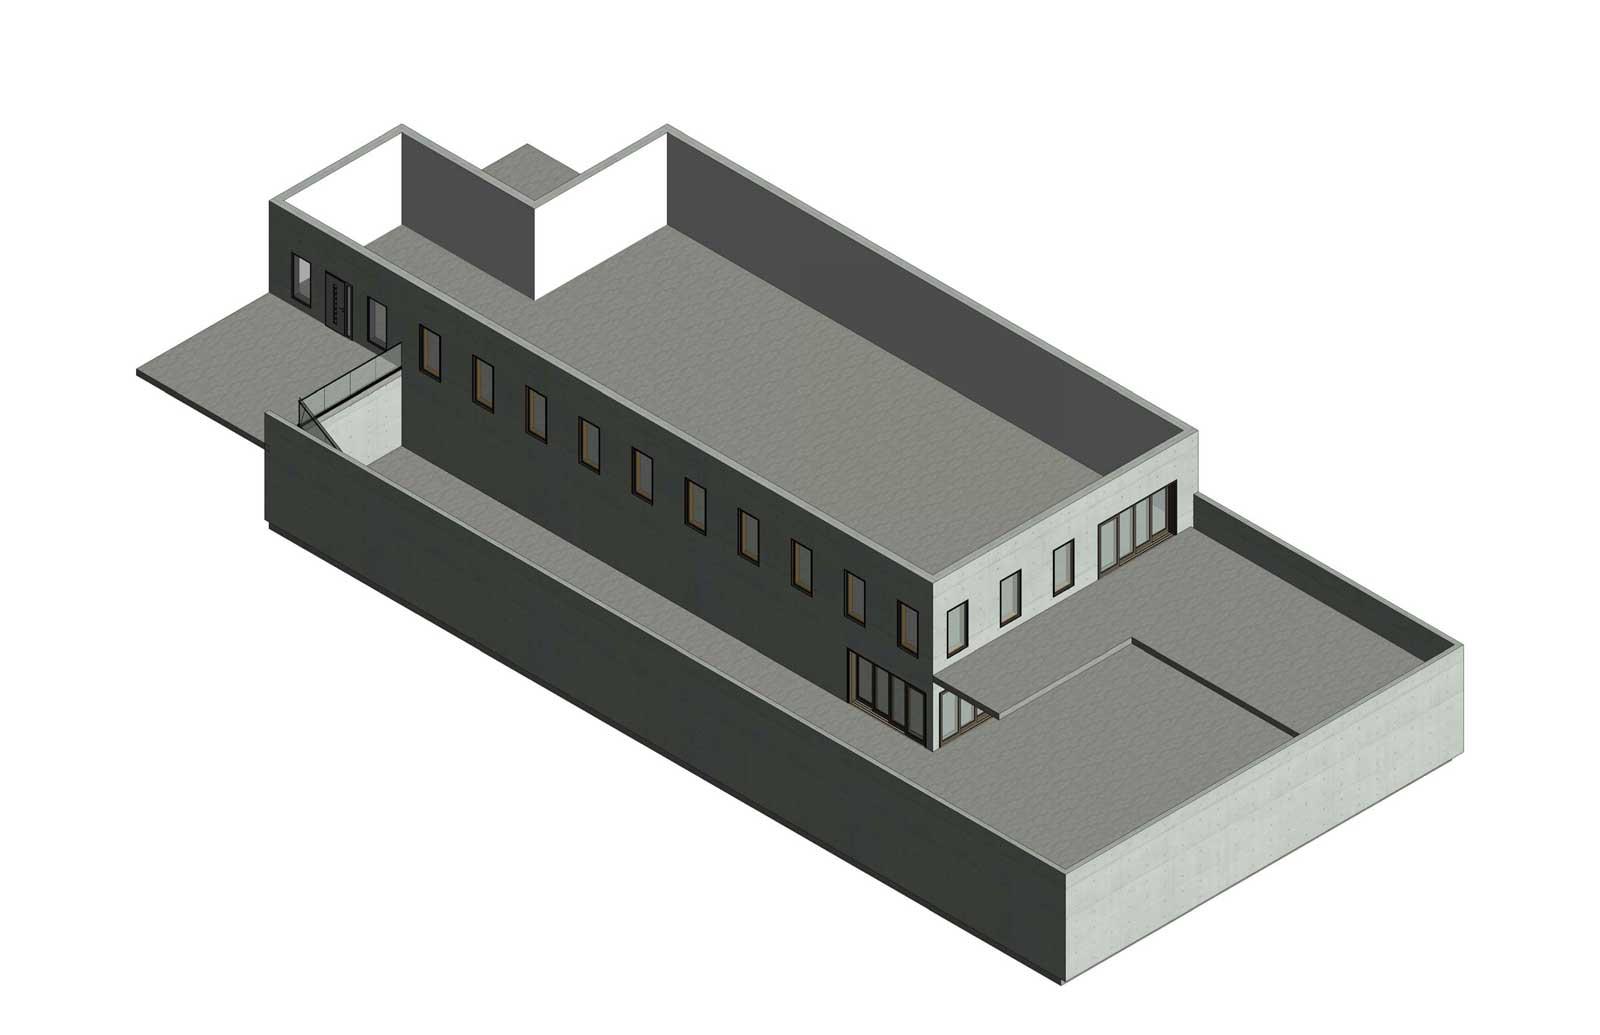 17x30 - Single Family High End Residence Axon